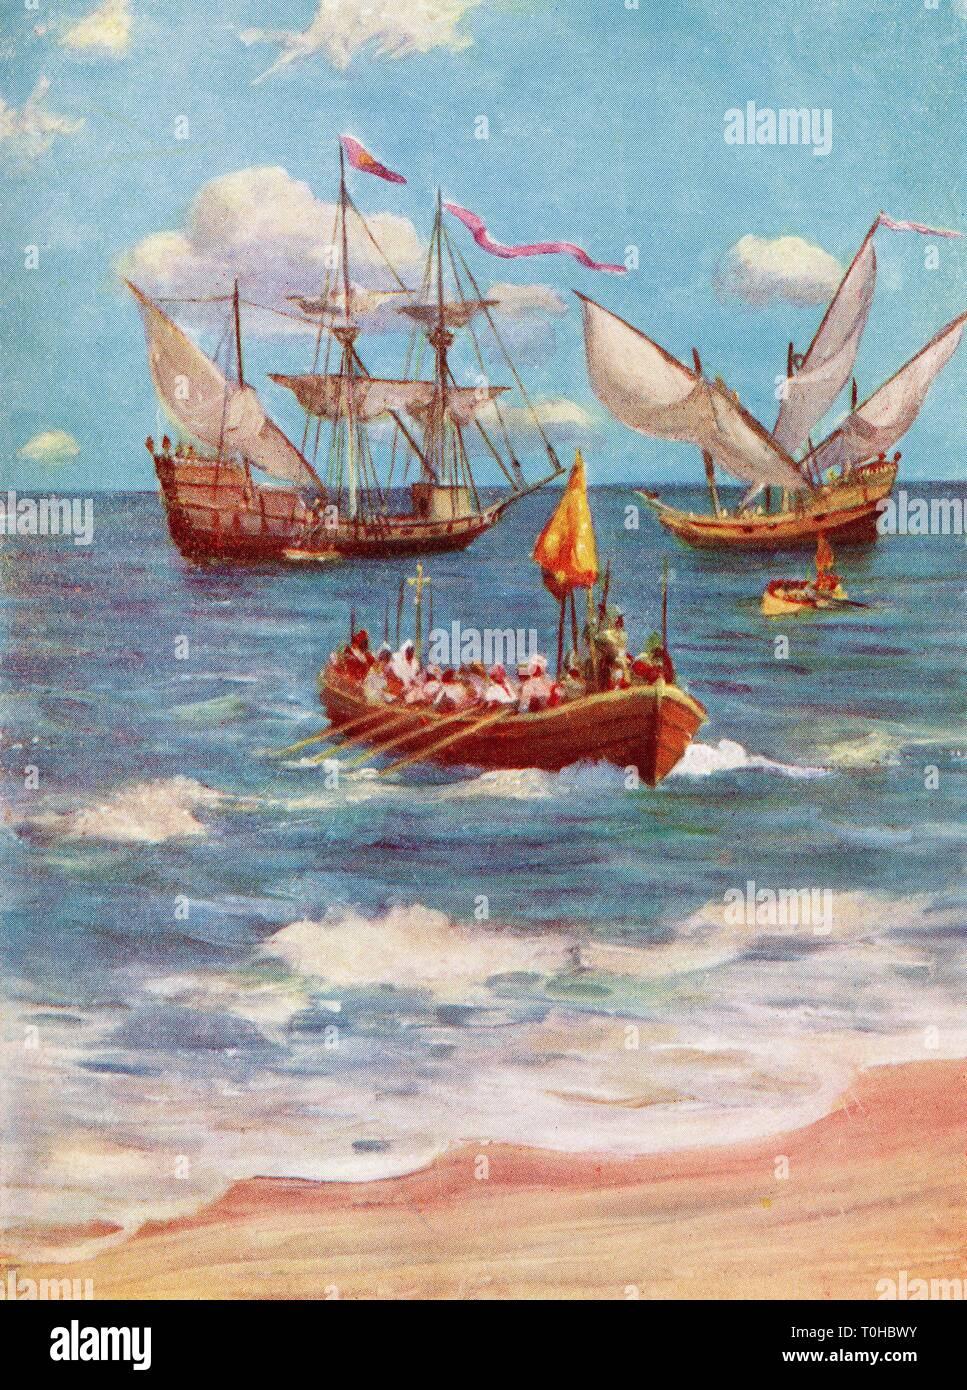 Vasco Da Gama landing near Calicut India, Asia 1498 - Stock Image